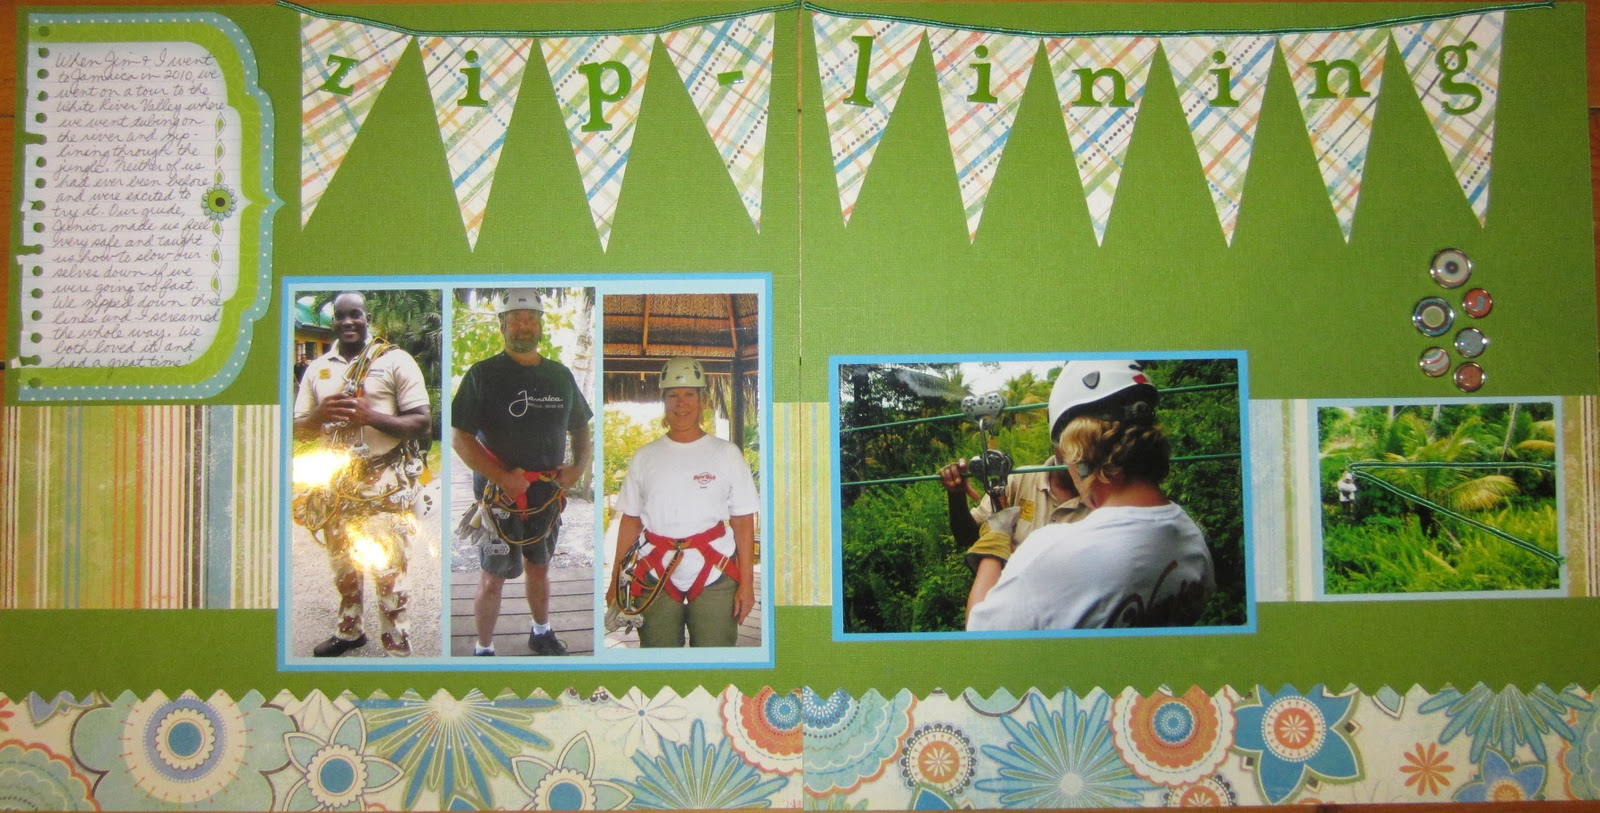 Ziplining scrapbook ideas - Jeanne And Jim Went Zip Lining In Jamaica